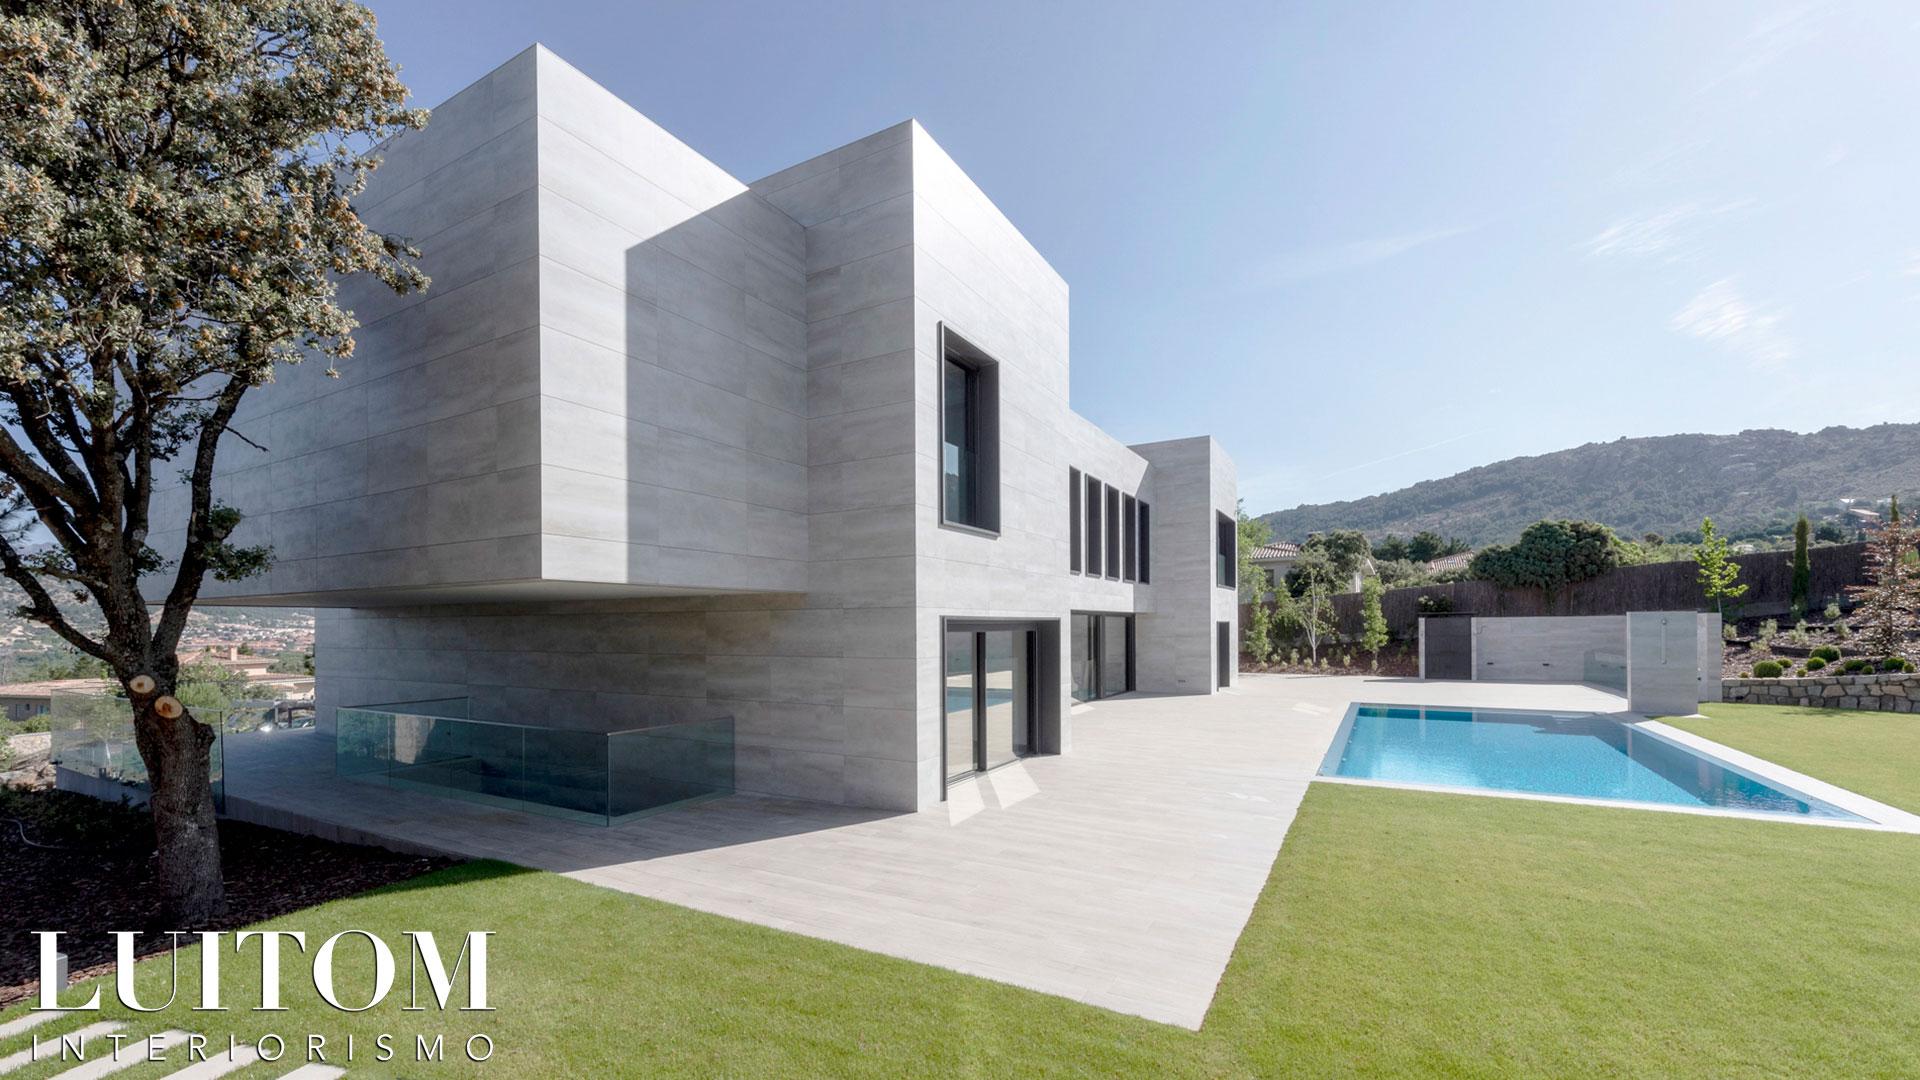 casas-modernas-lujo-villas-arquitectos-madrid-singular-modern-home-project-architect-proyecto-arquitectura-12